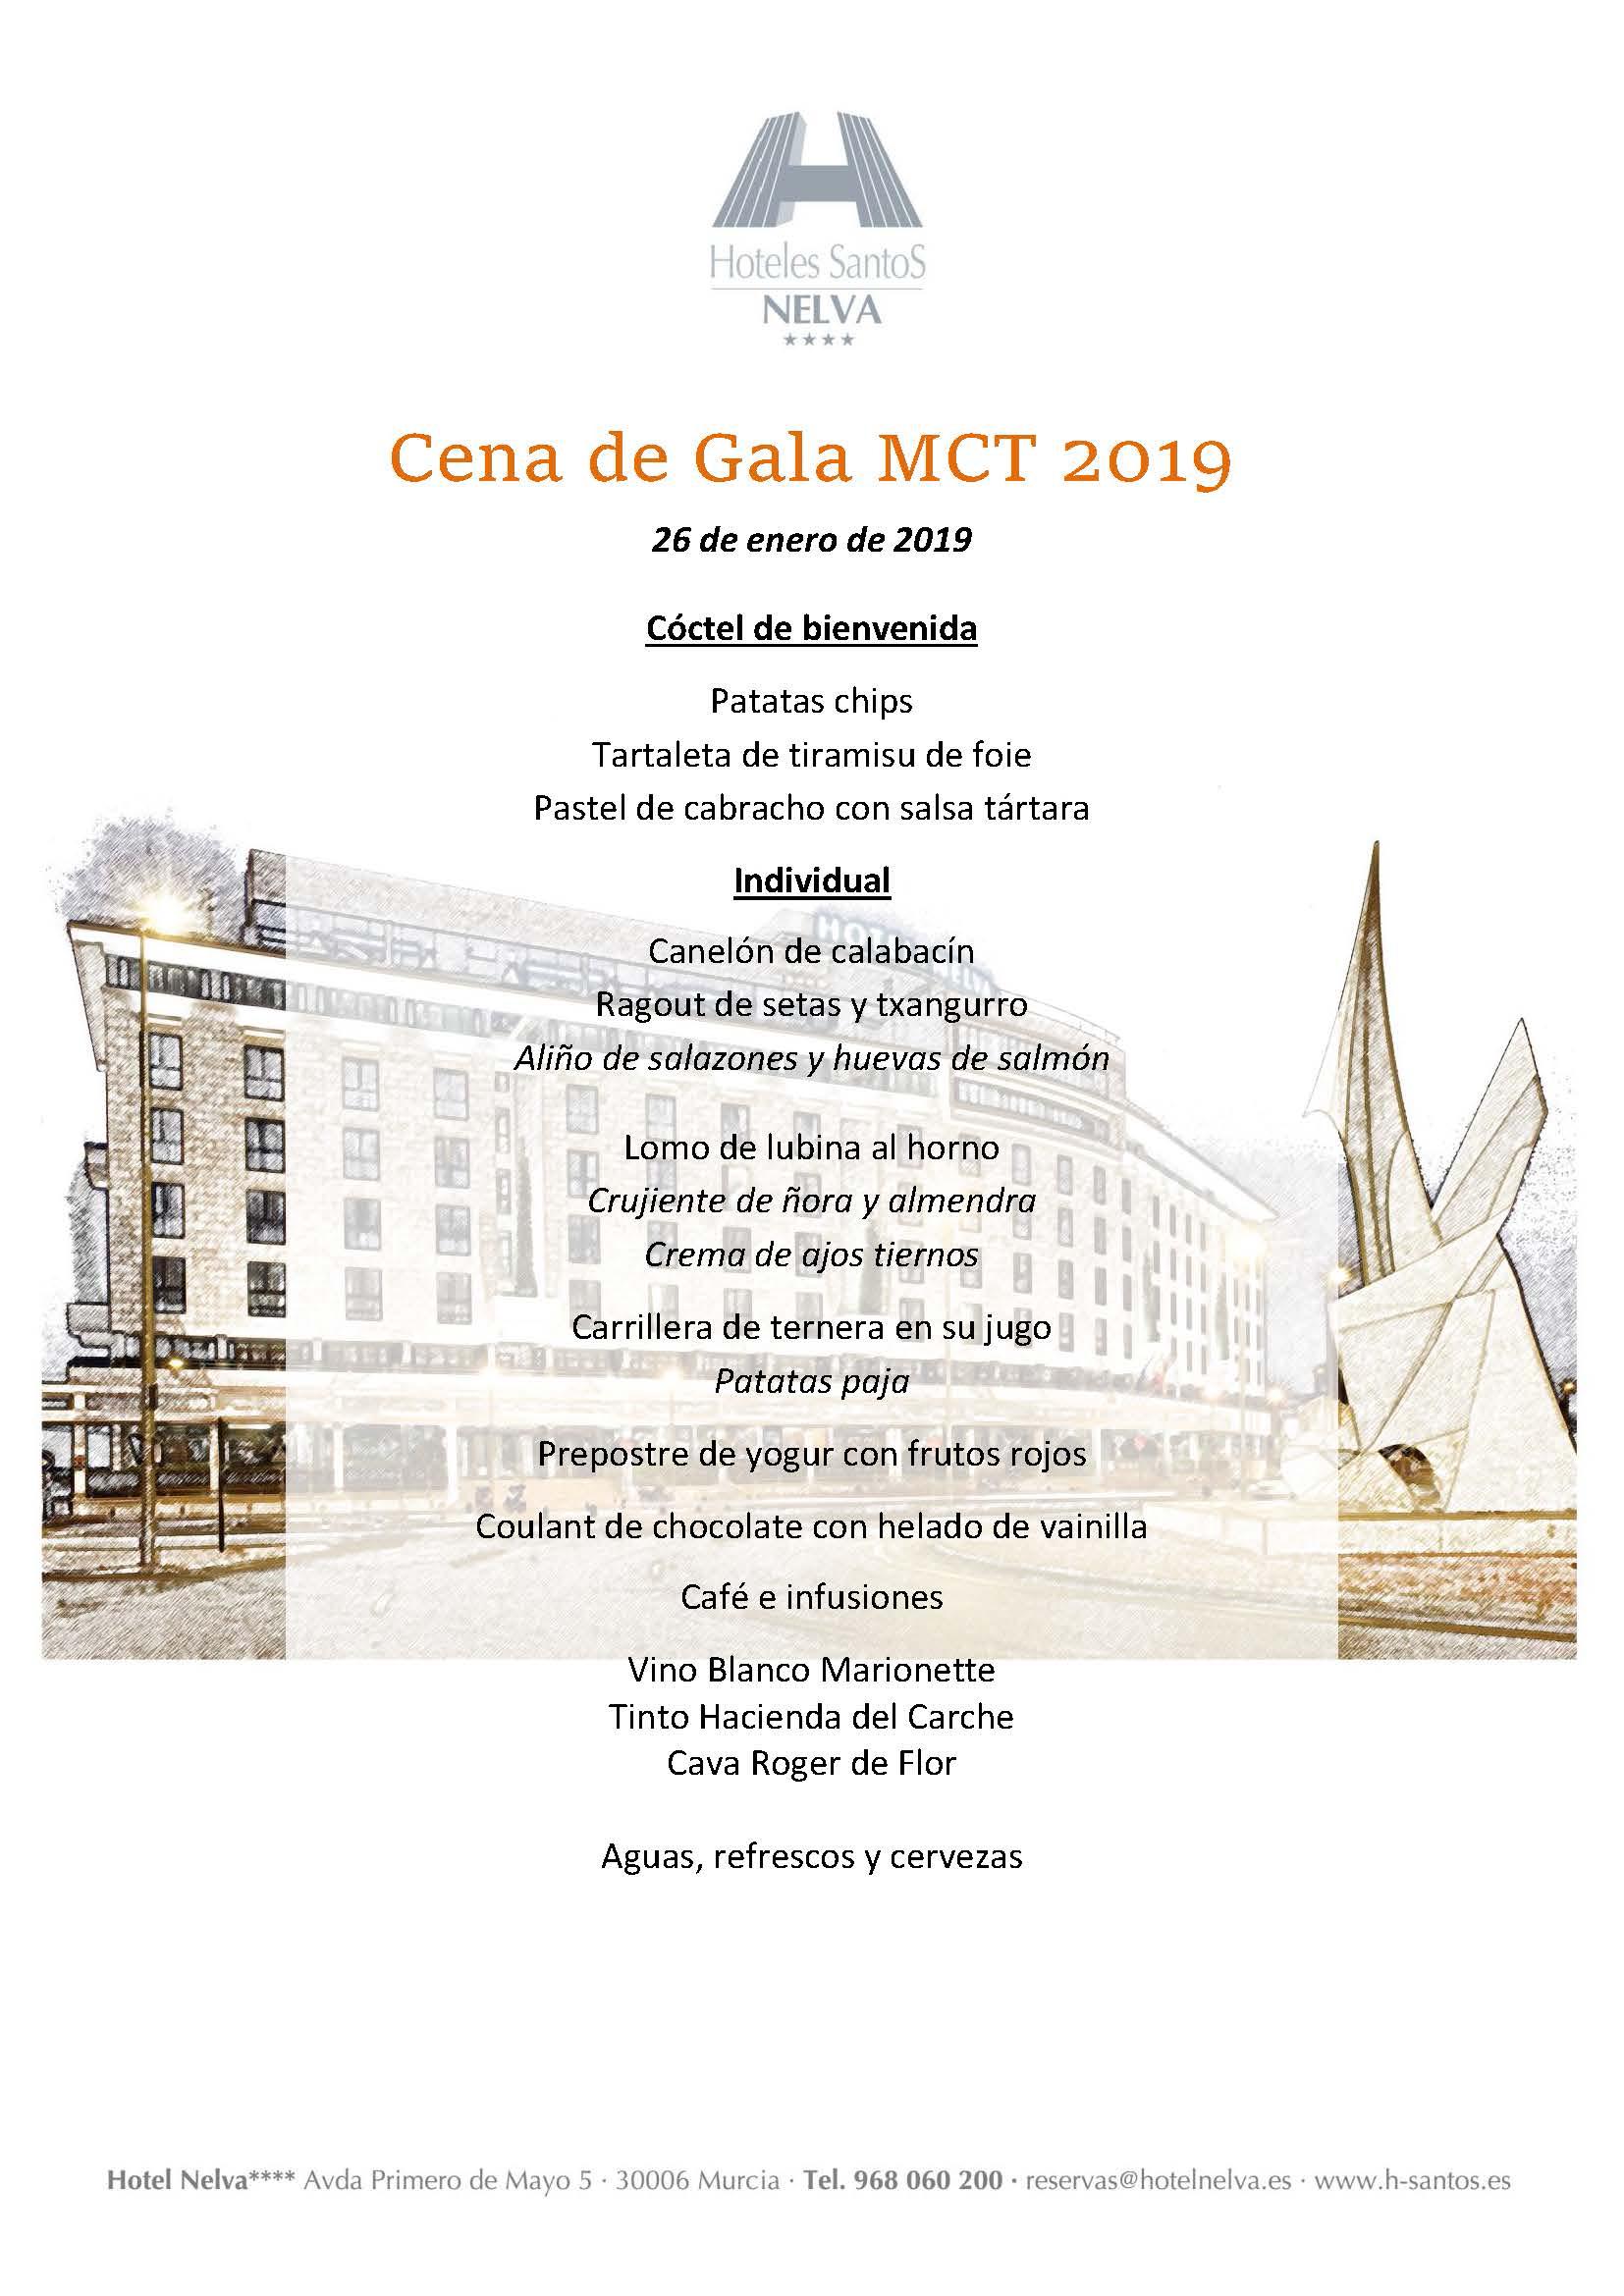 Menú Gala MCT1919 2019